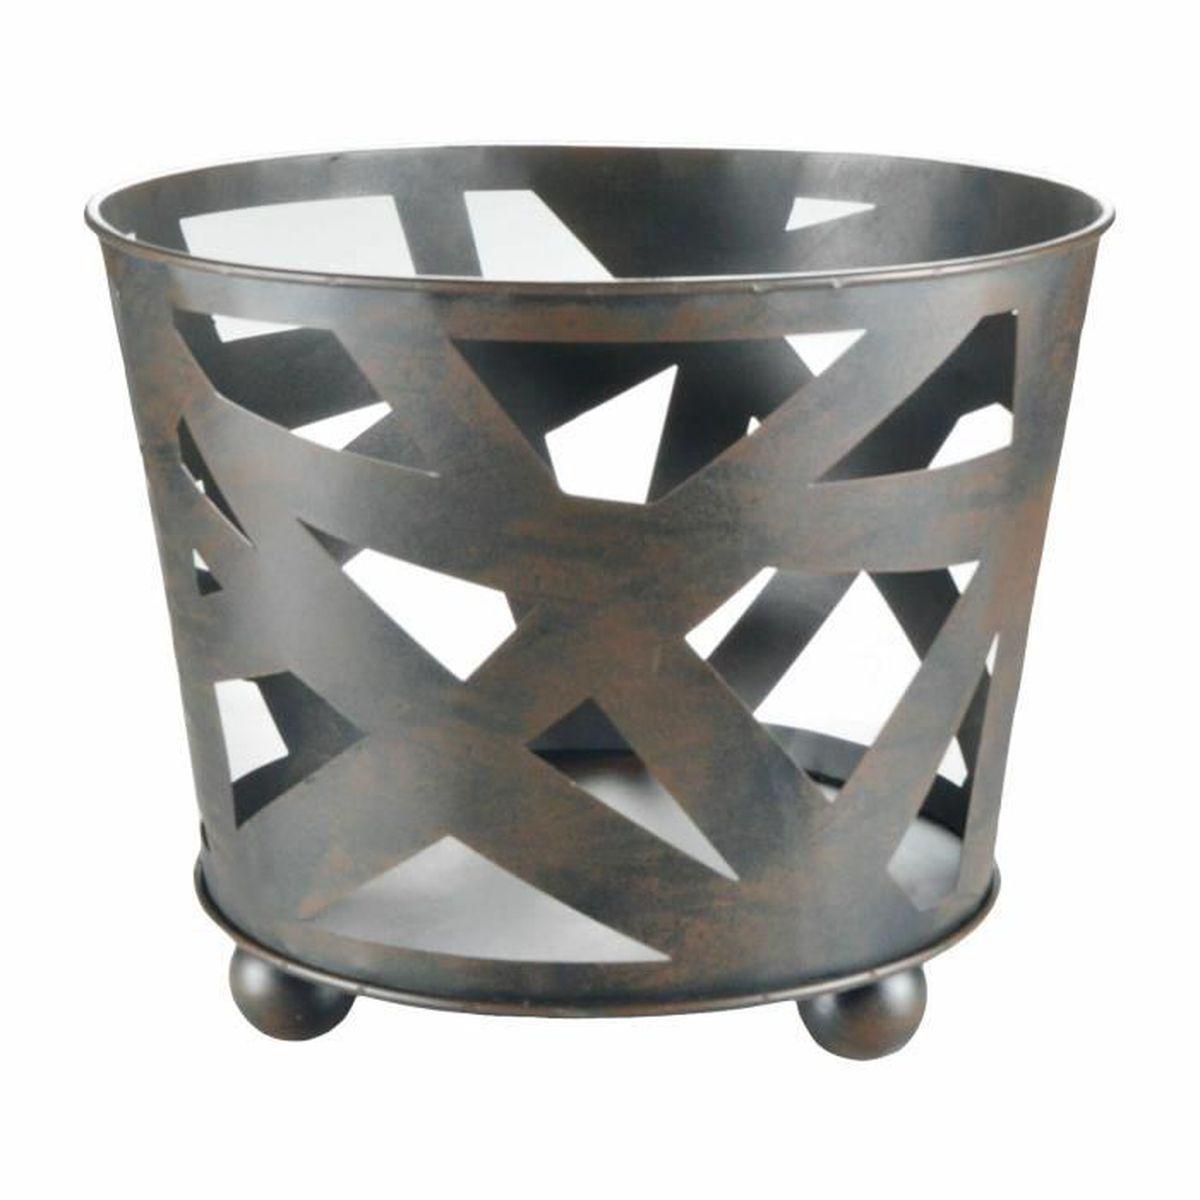 Prix Cheminee Exterieur Feu Chic Design brasero chauffage foyer feu de camp jardin exterieur cheminee corbeille